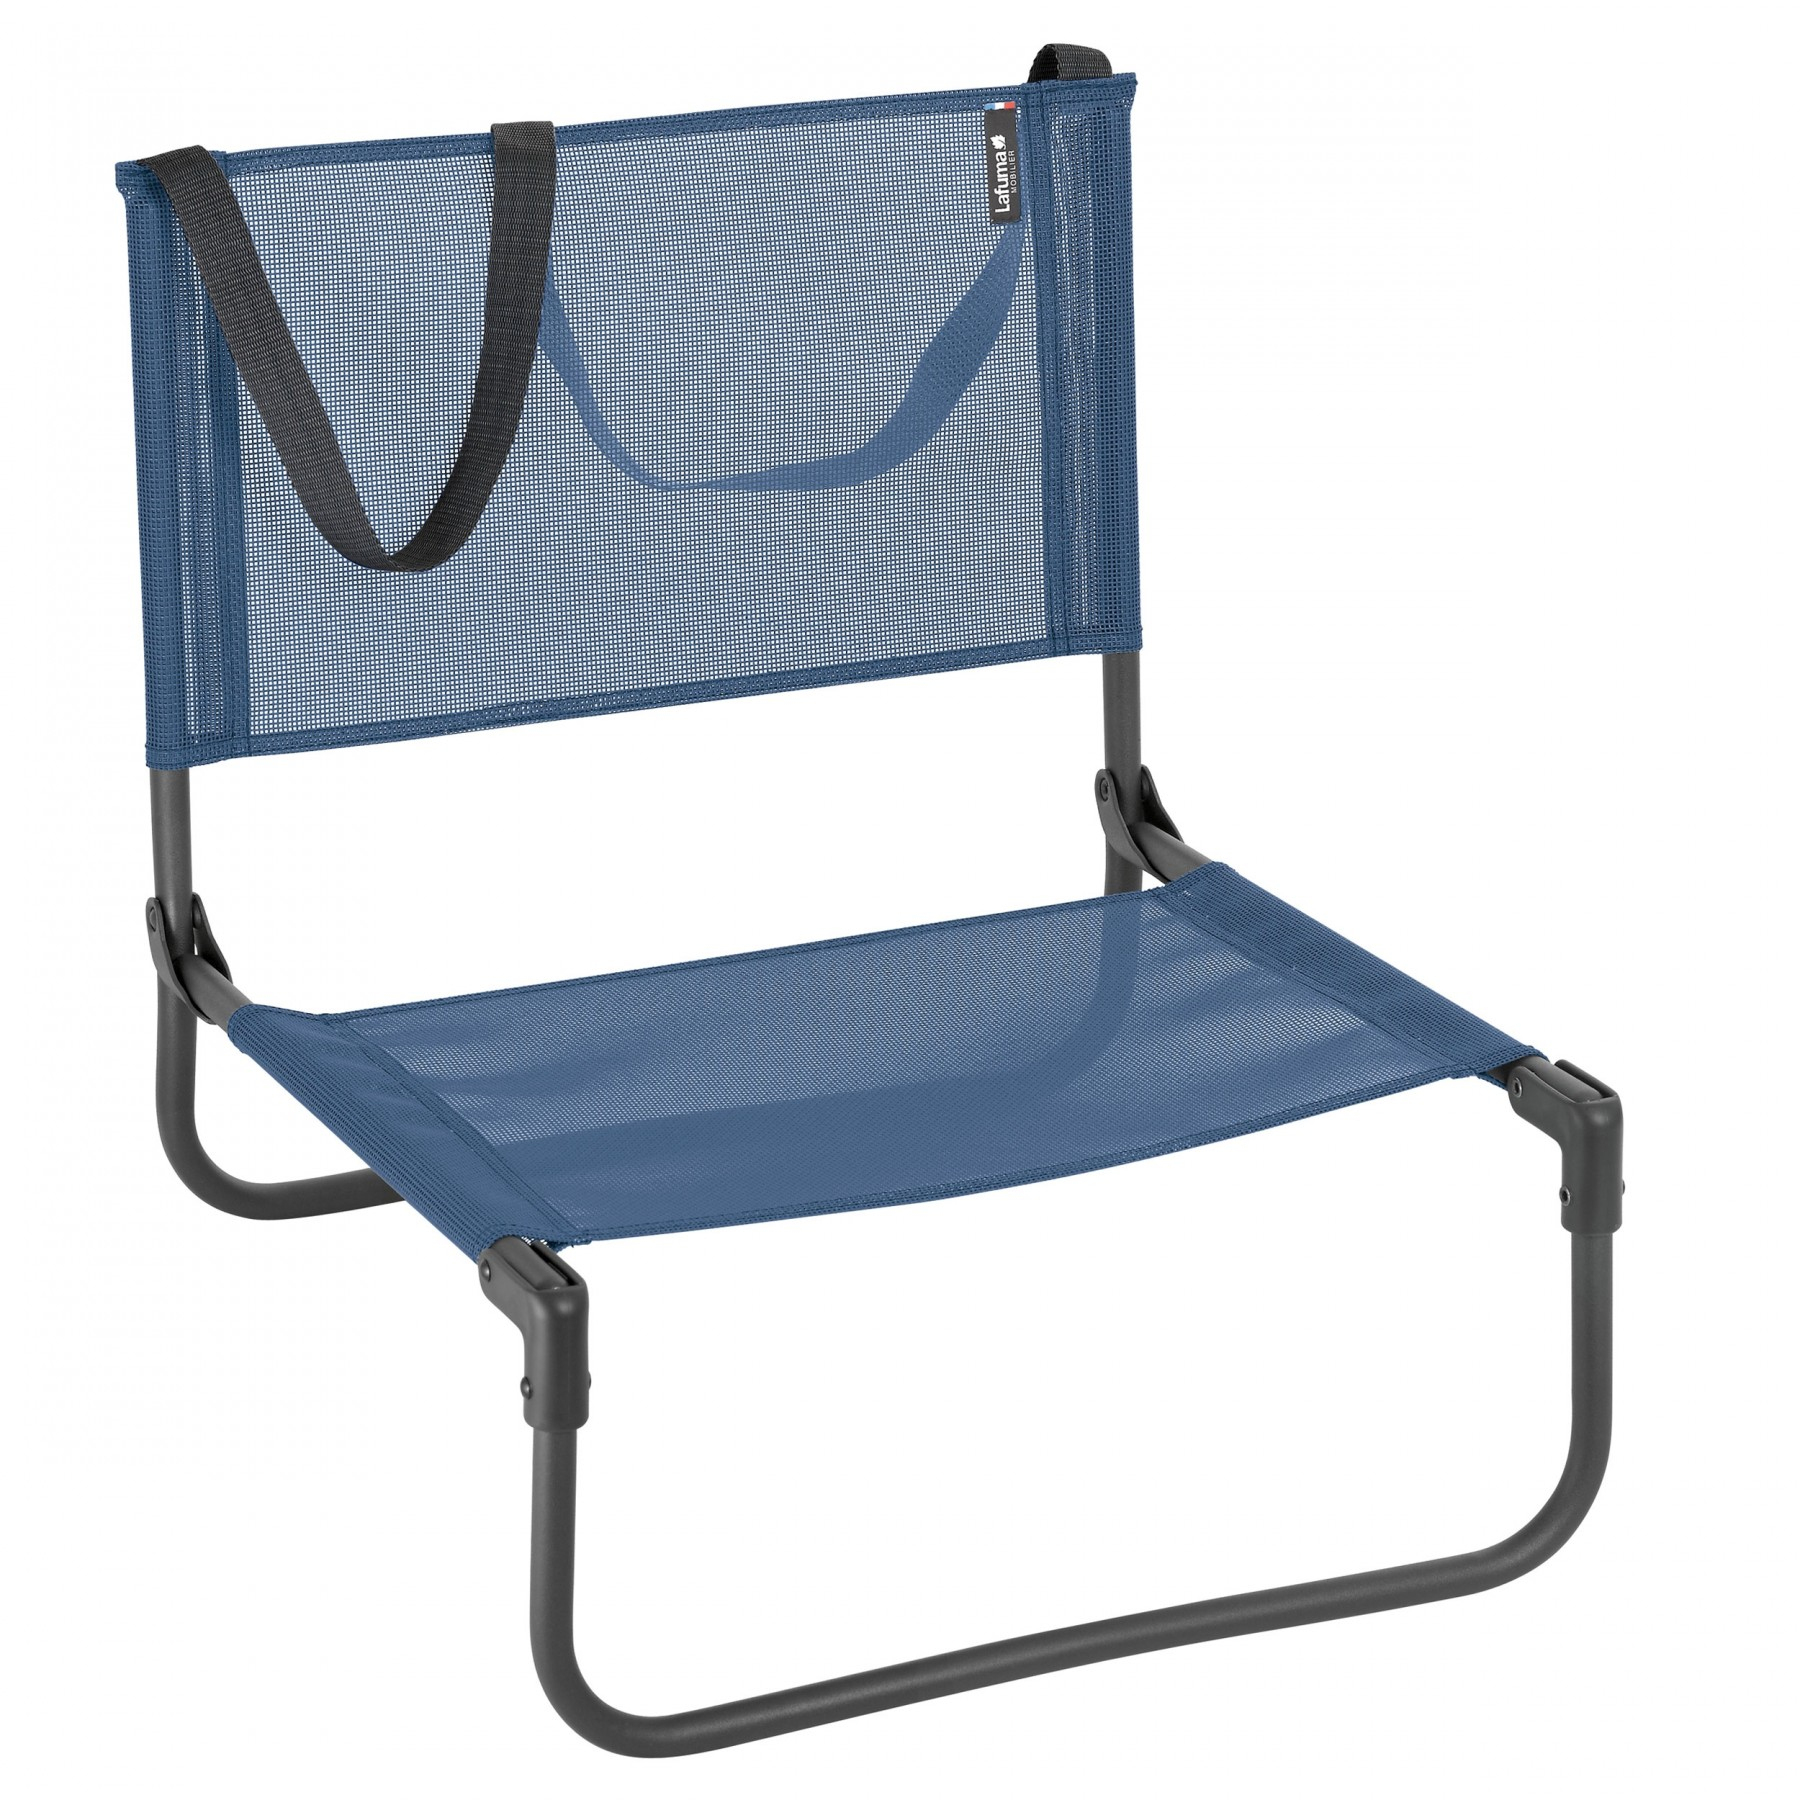 Chaise Basse Cb à Chaise Basse Jardin